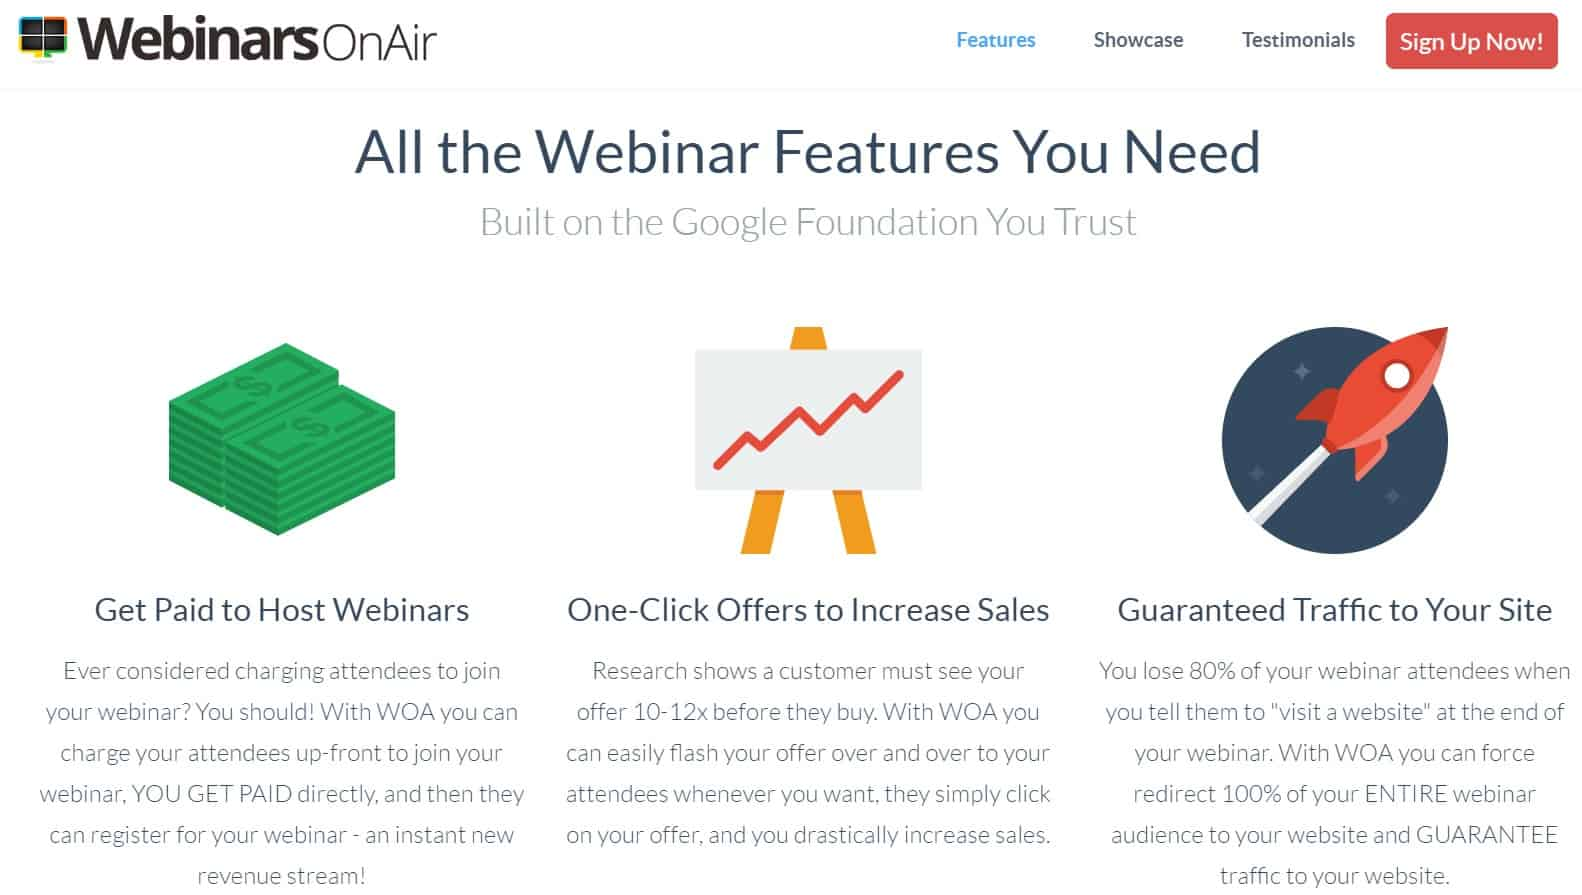 Webinars On Air - Pricing and Complete Review Webinars Onair